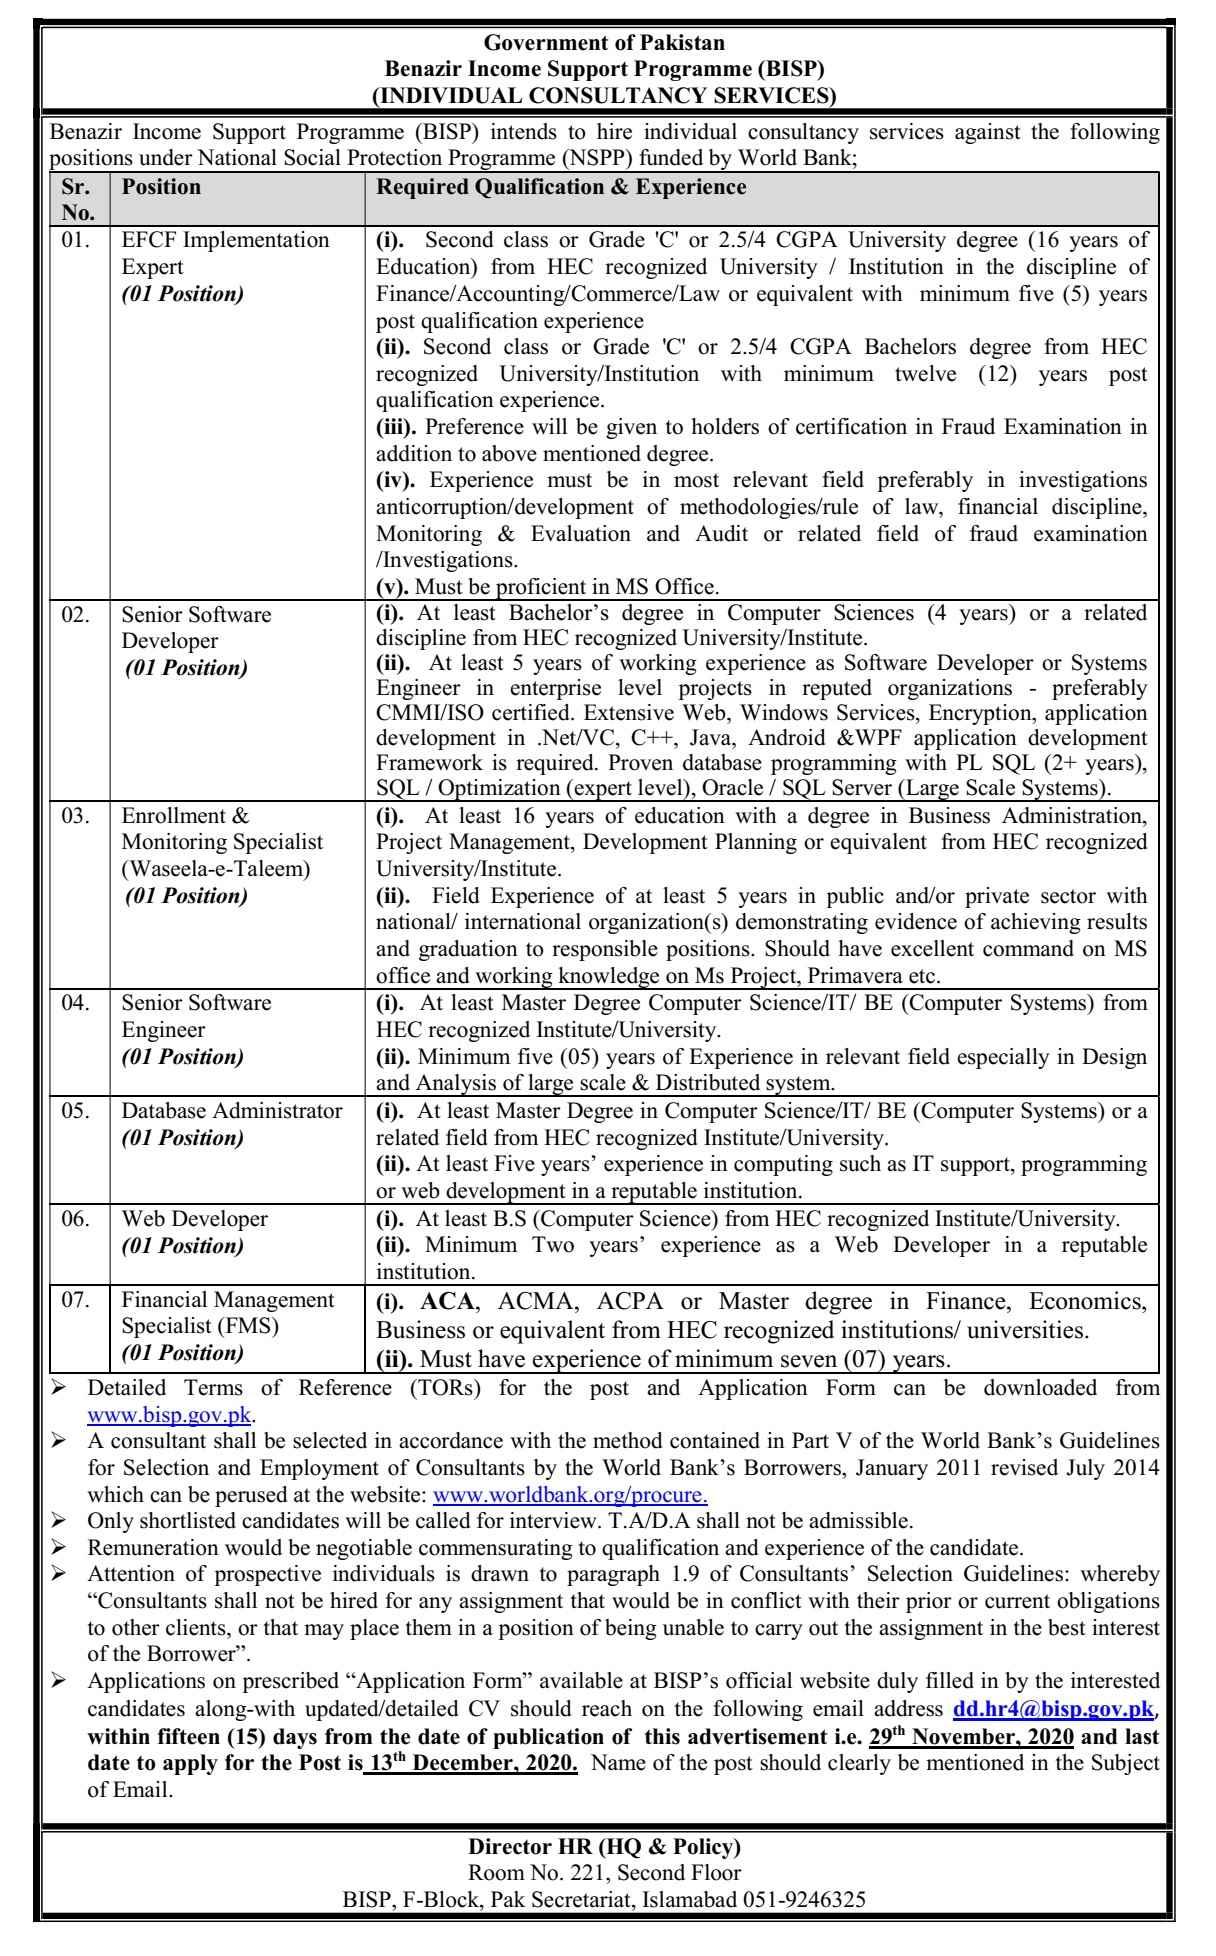 Benazir Income Support Programme BISP Latest Jobs 2020